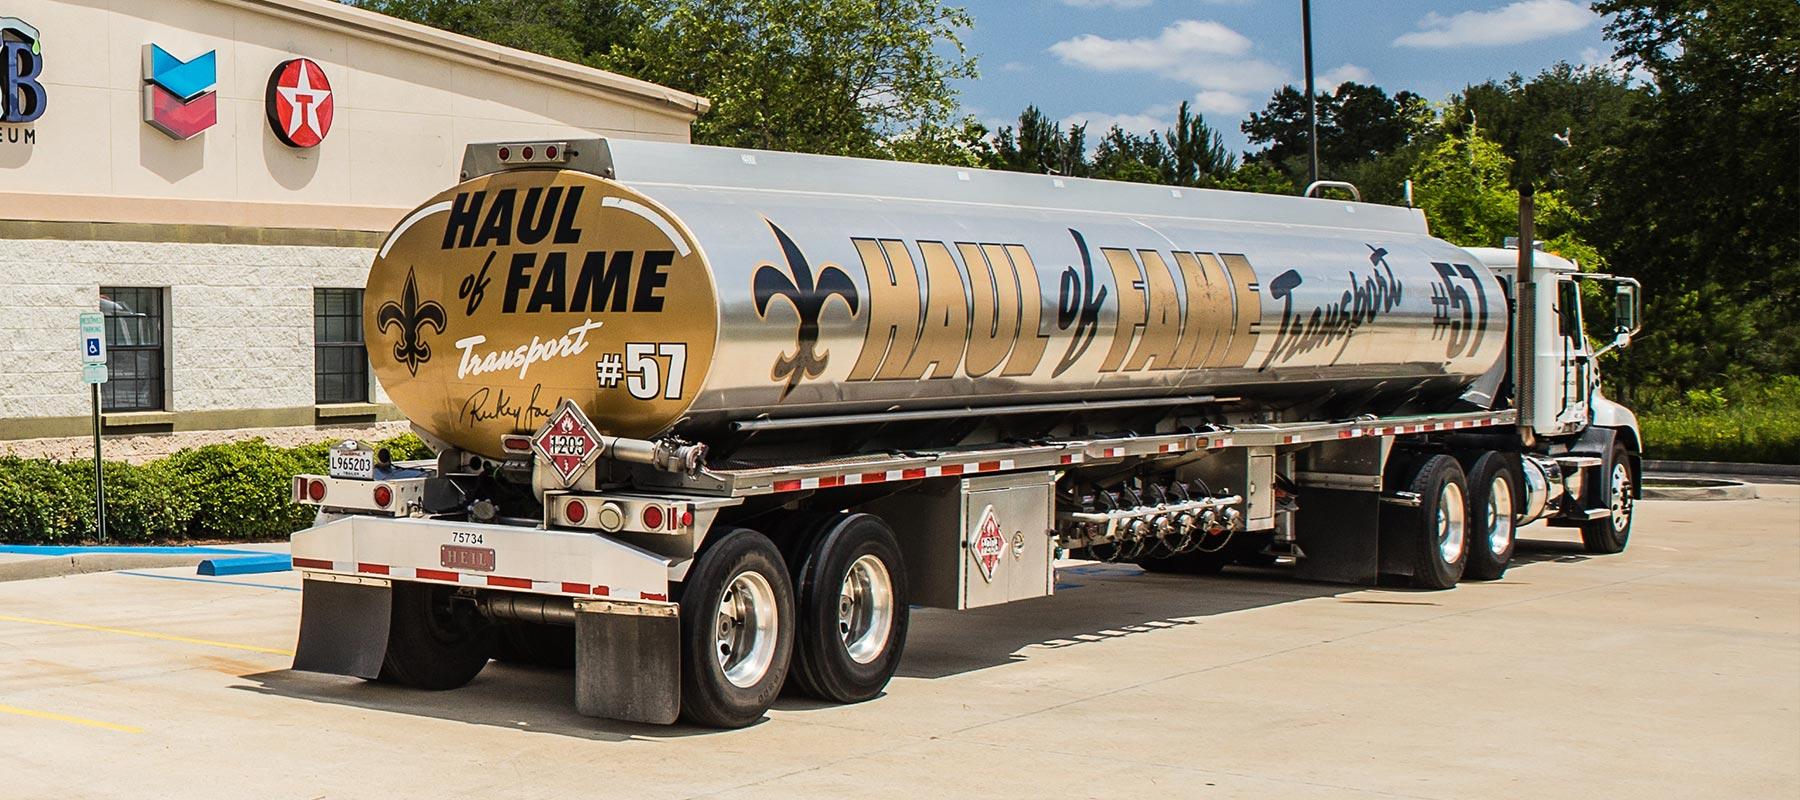 Haul of Fame Transport | Louisiana Fuel Hauling